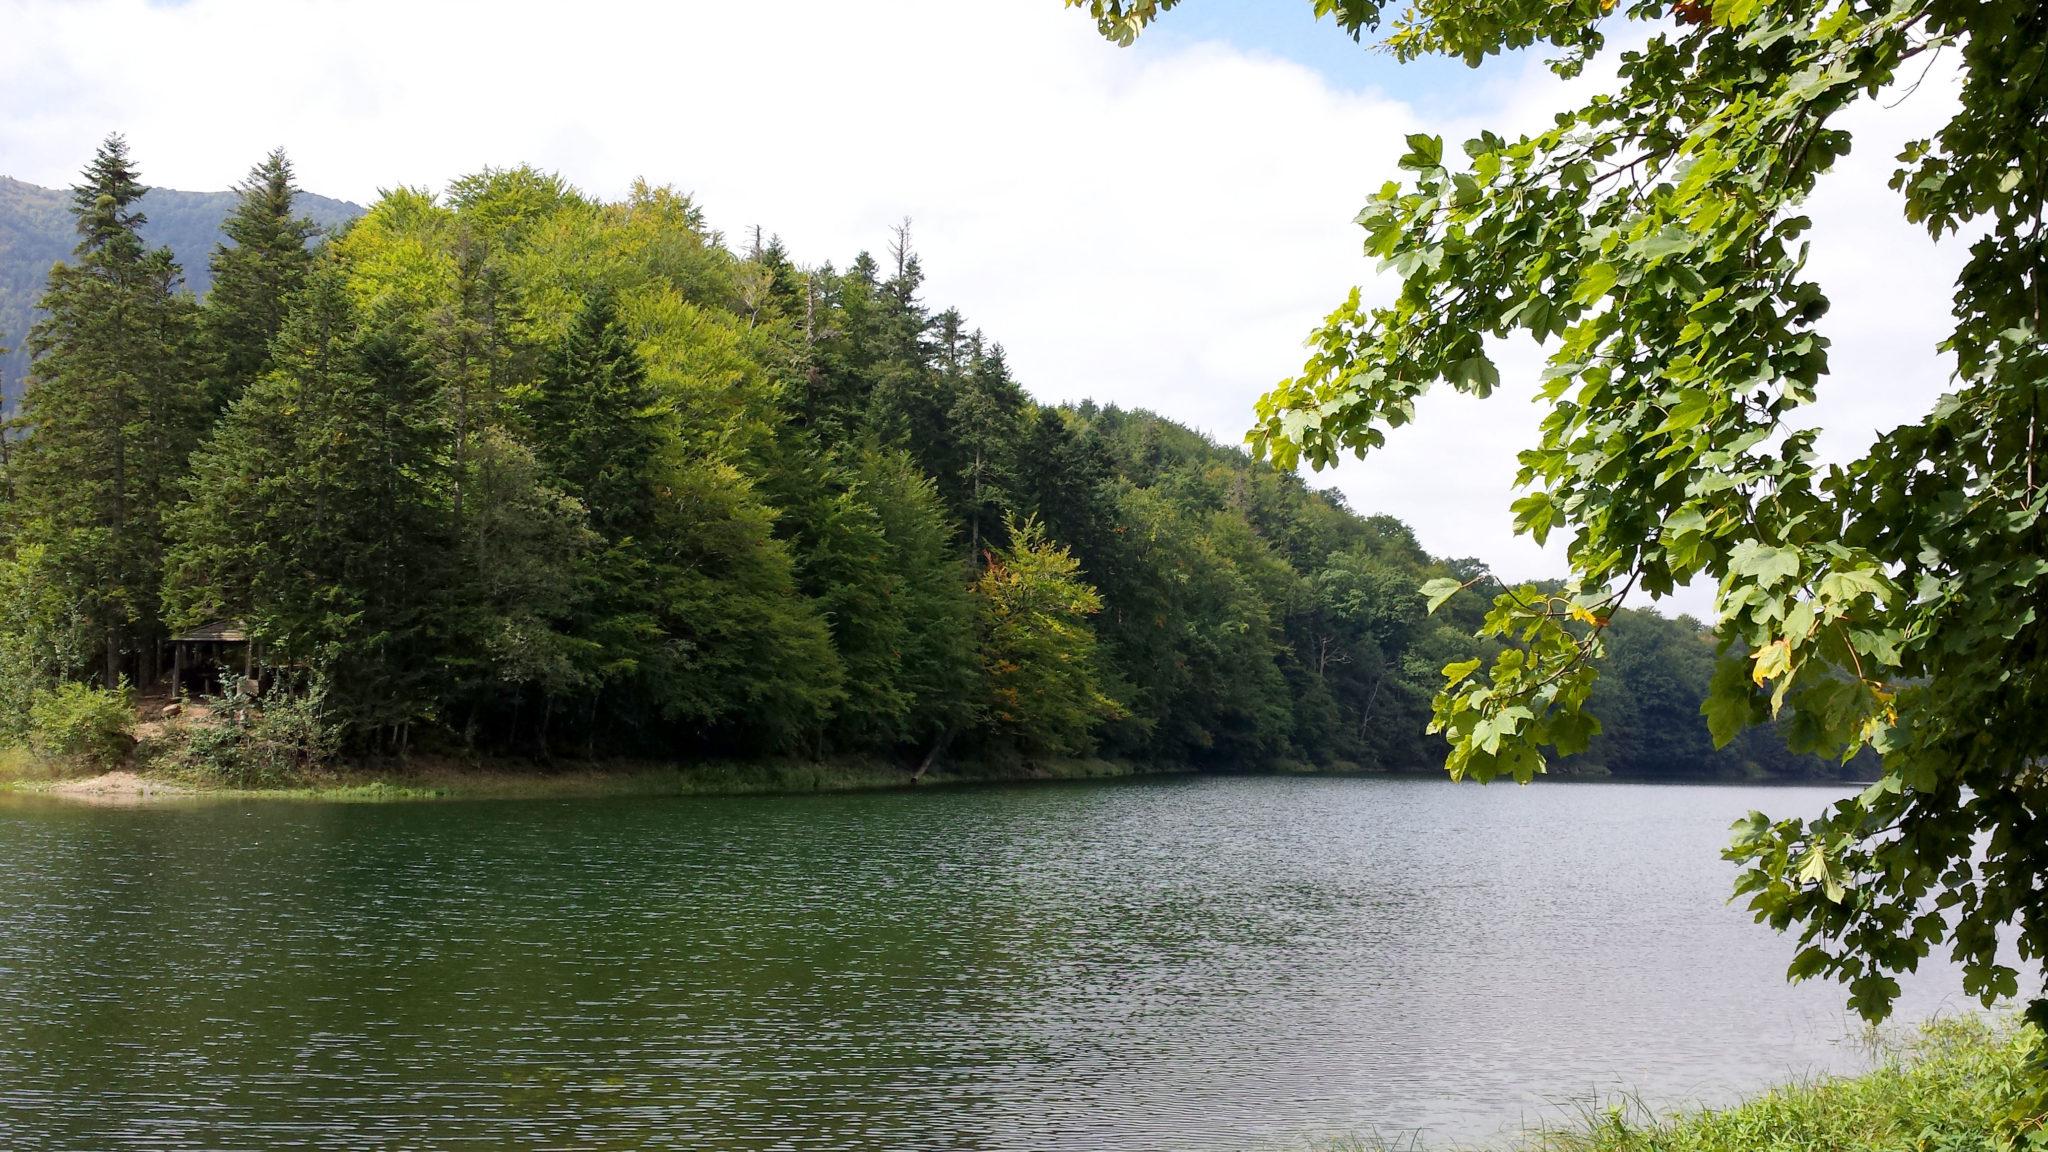 Hema_Montenegro_parc_national_biogradska_gora_forest_travel_voyage_blog19